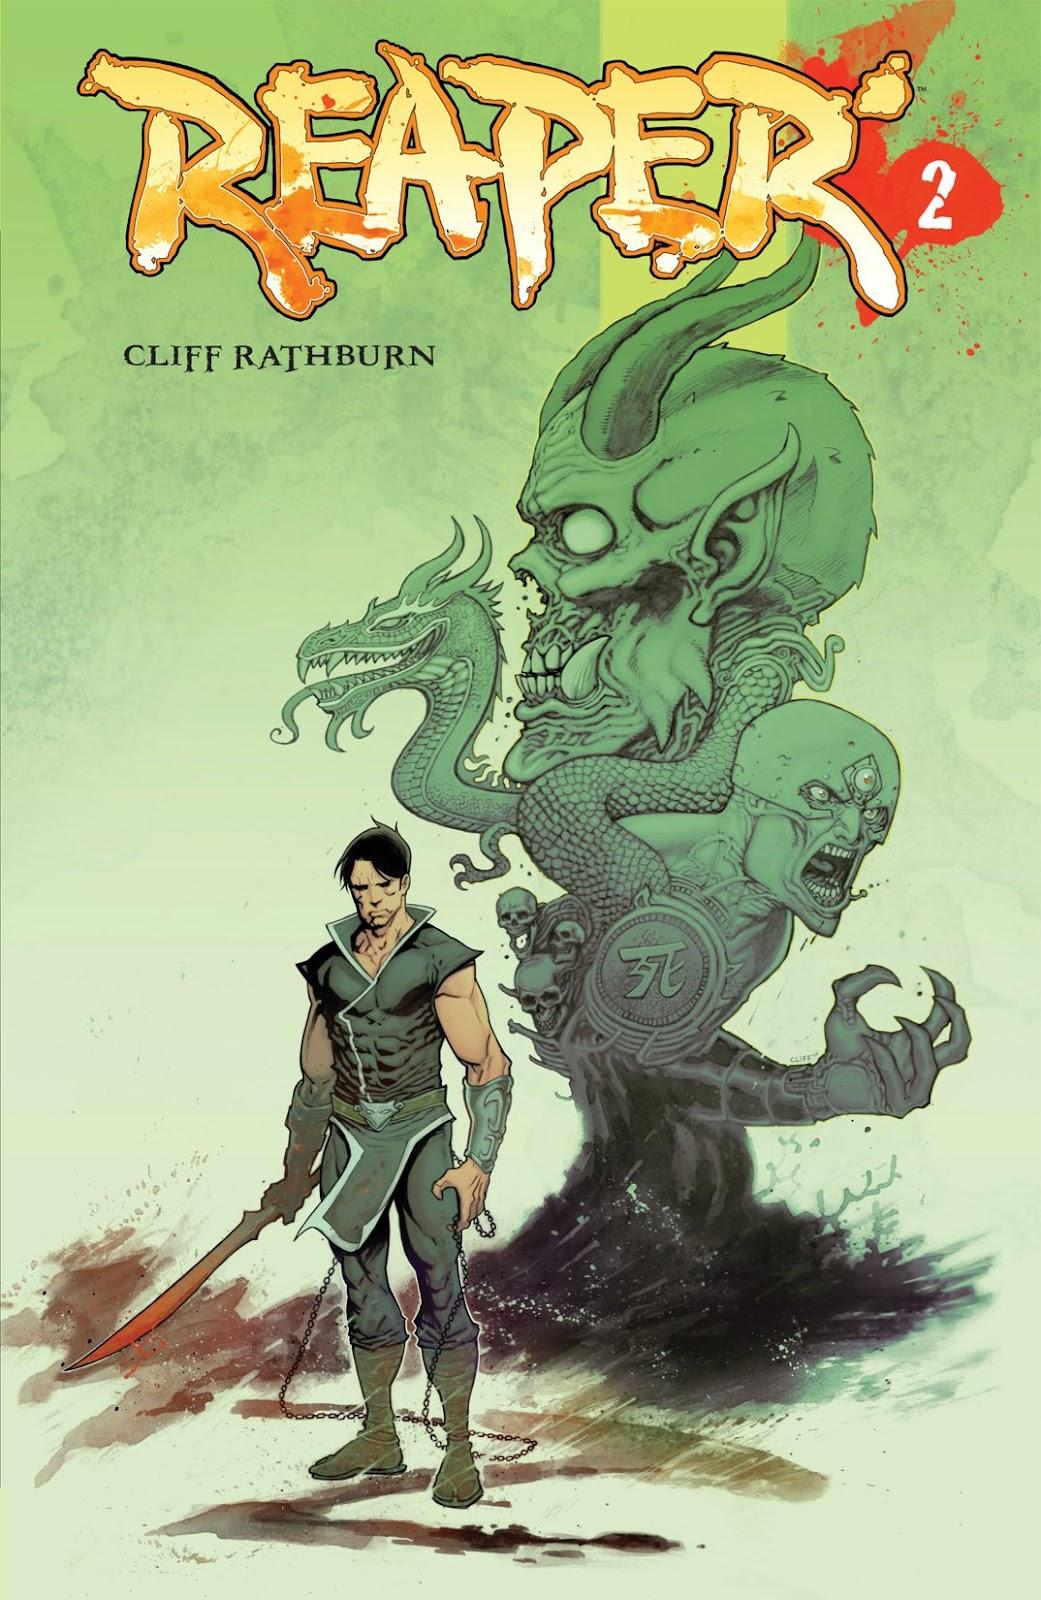 Read online Reaper comic -  Issue #2 - 1